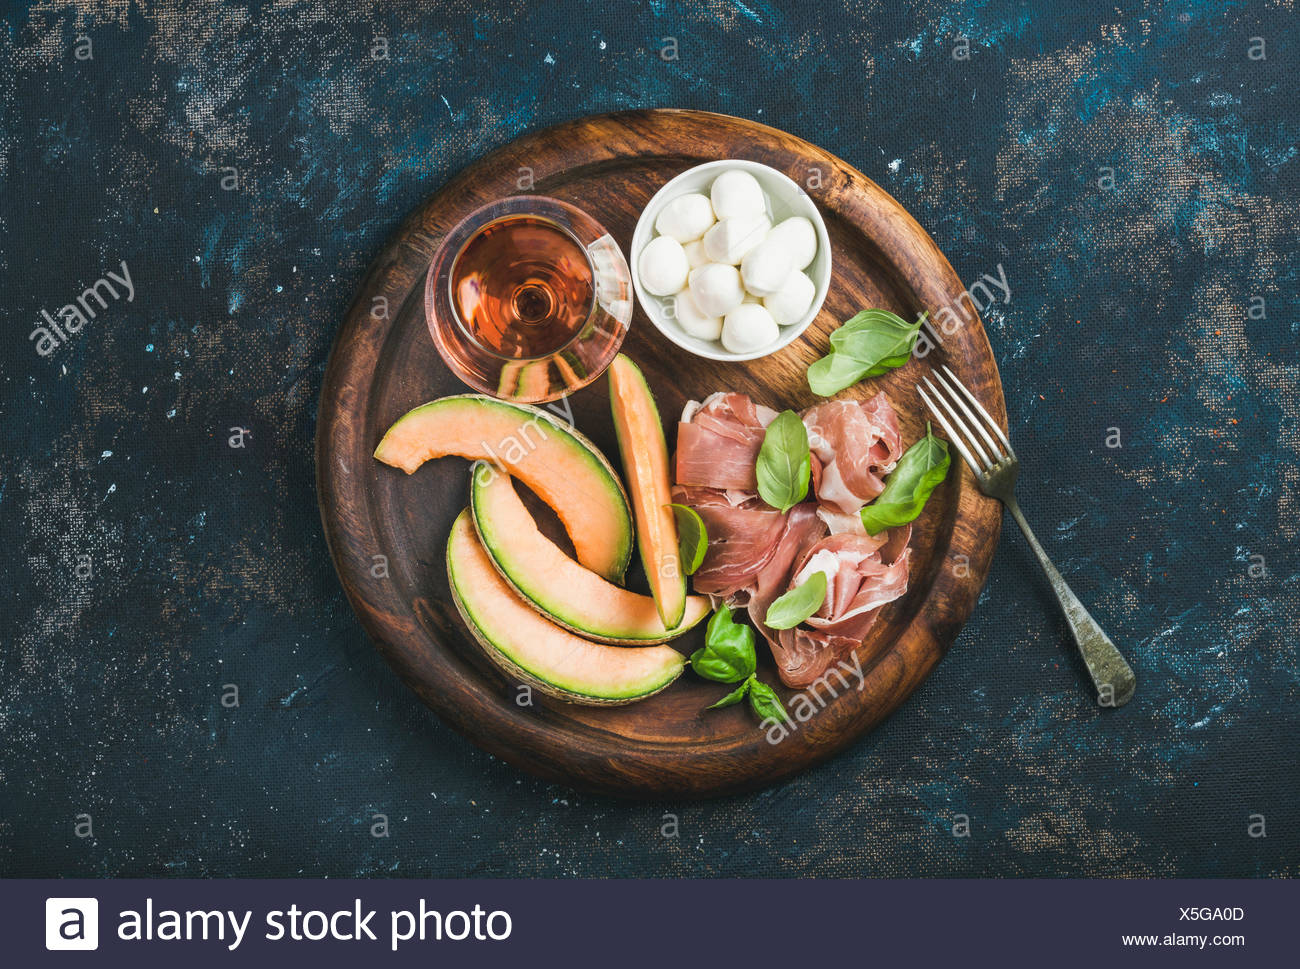 Prosciutto di Parma, cantaloupe melon, mozzarella cheese in bowl, fresh basil leaves and glass of rose wine in round serving tra - Stock Image